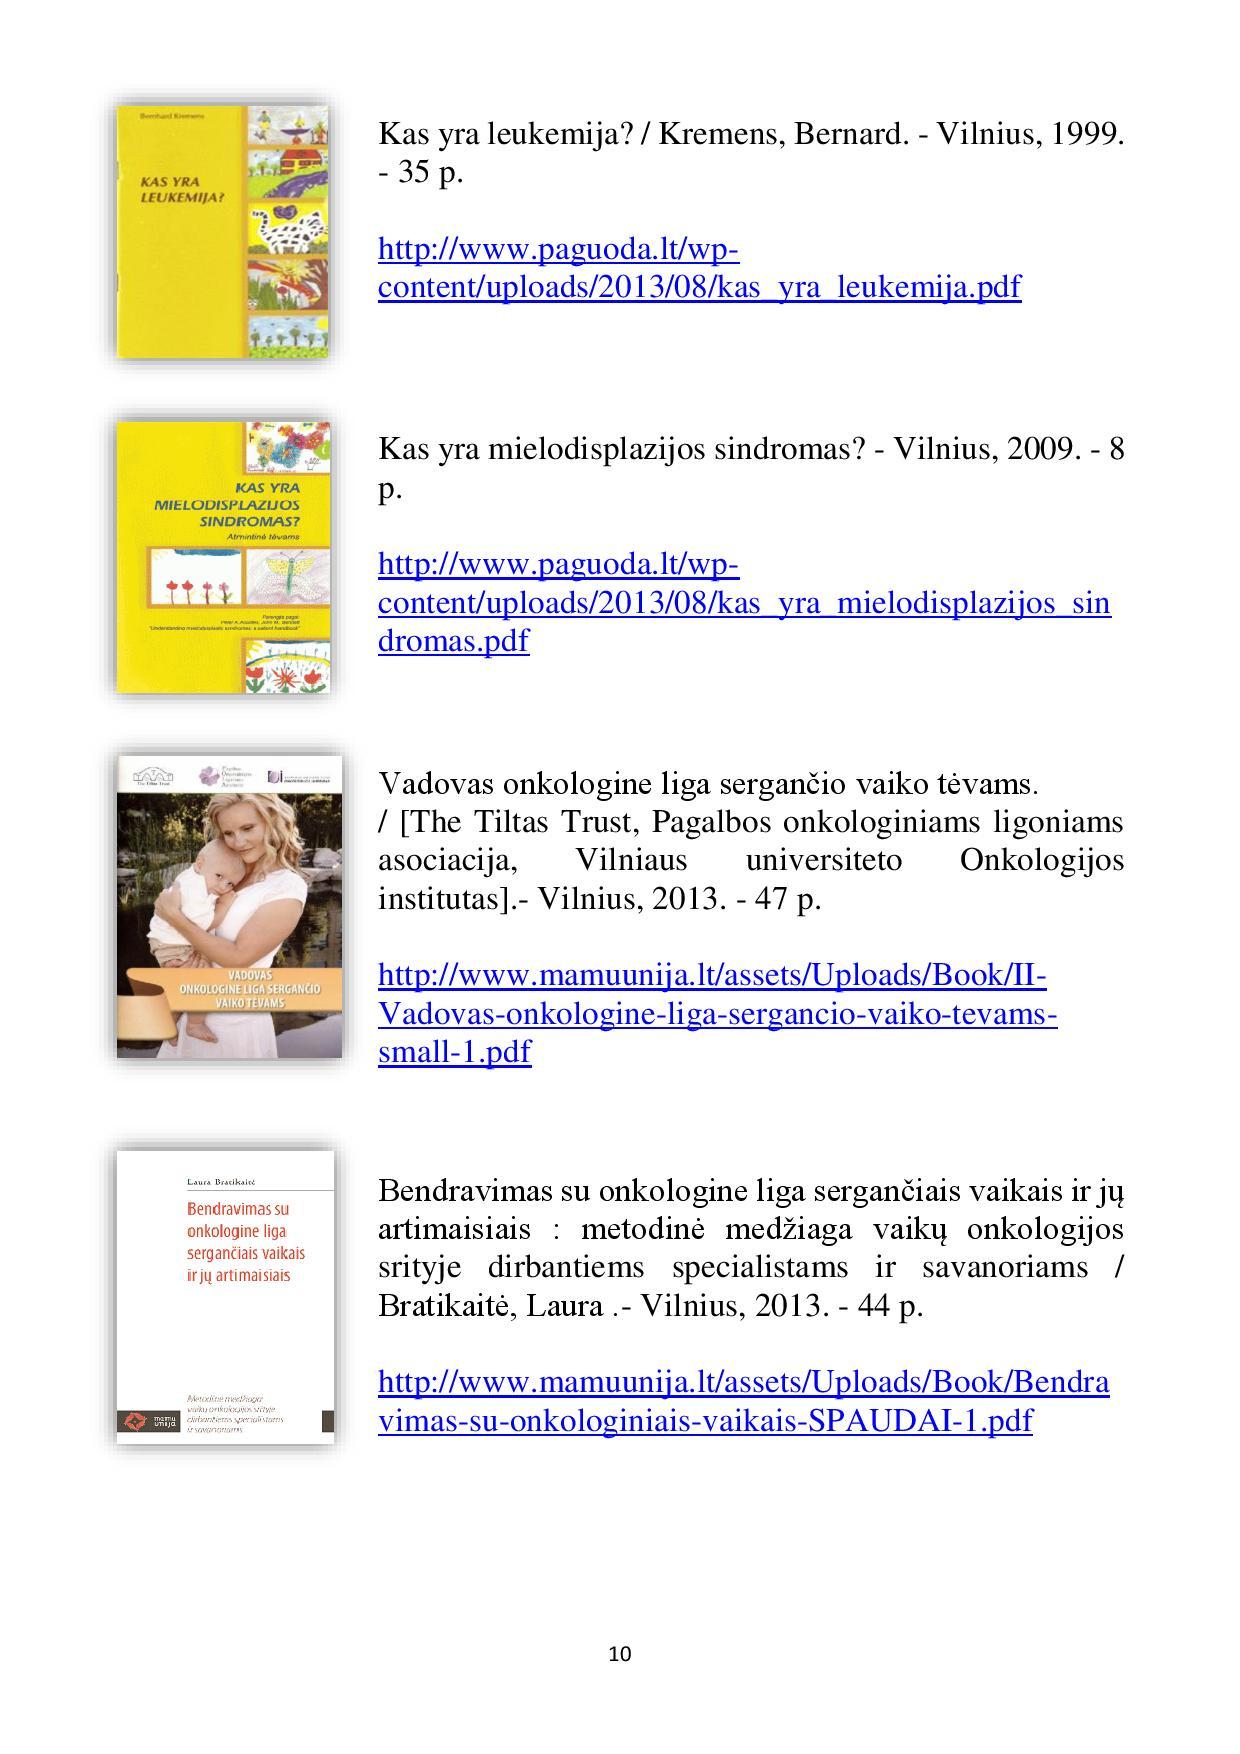 Sergantiems onkologinėmis ligomis -page-010